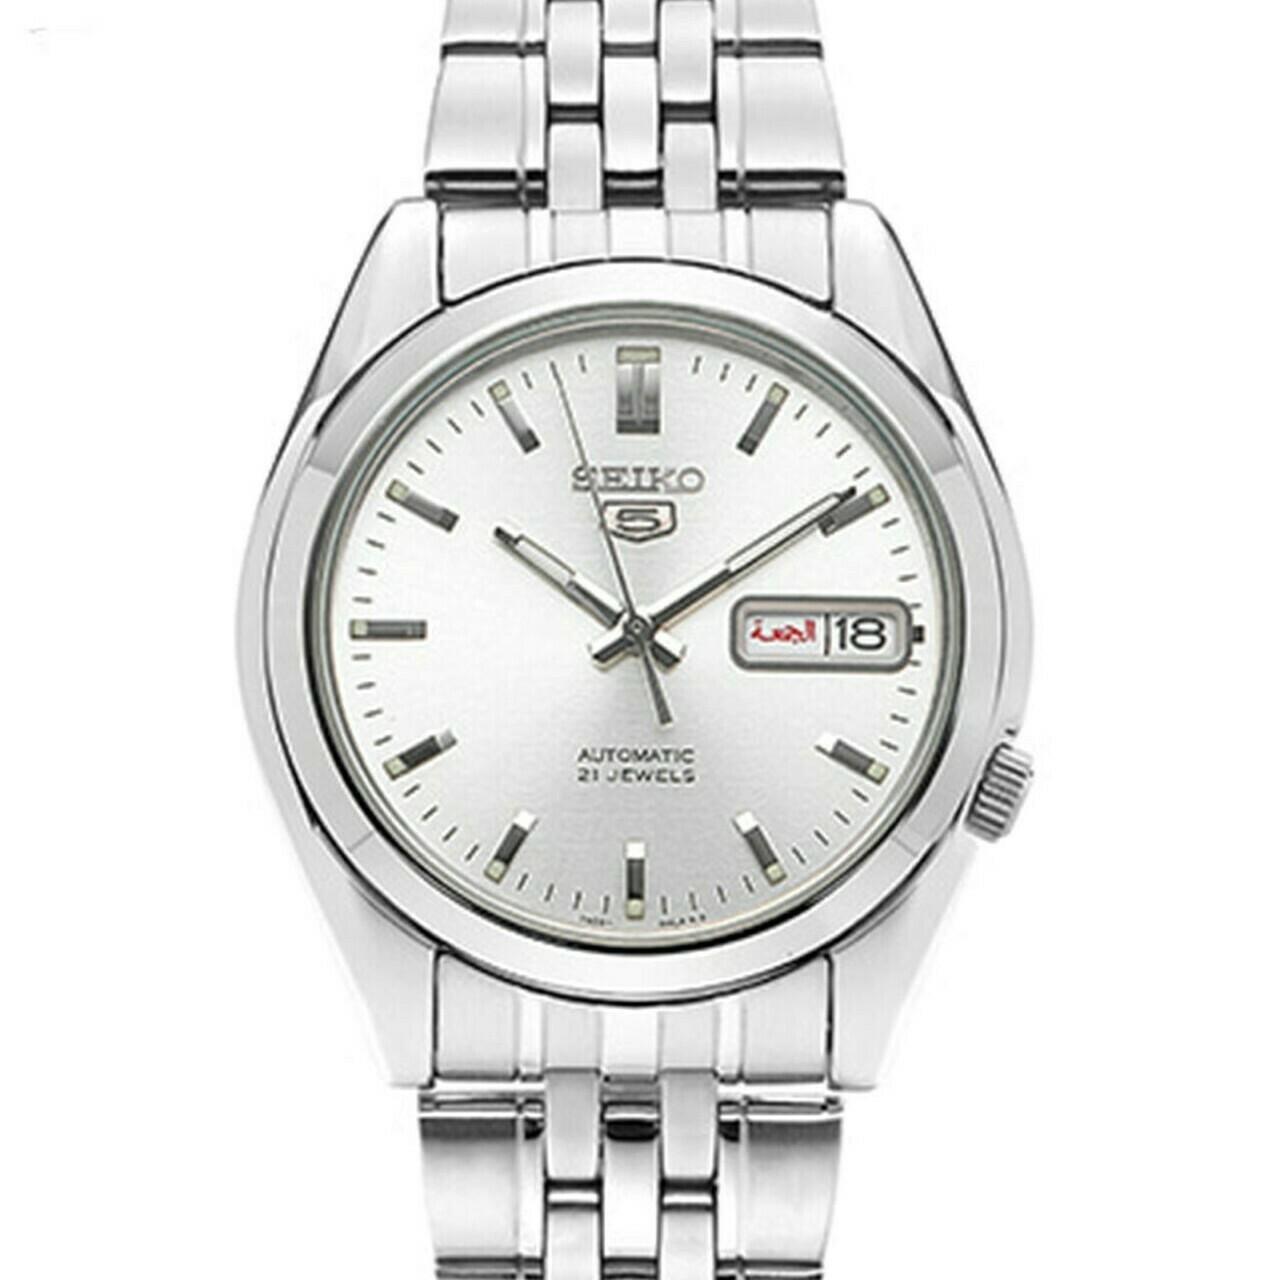 Reloj Automático hombre Seiko 5 SNK355K1 dial plata 37mm correa acero